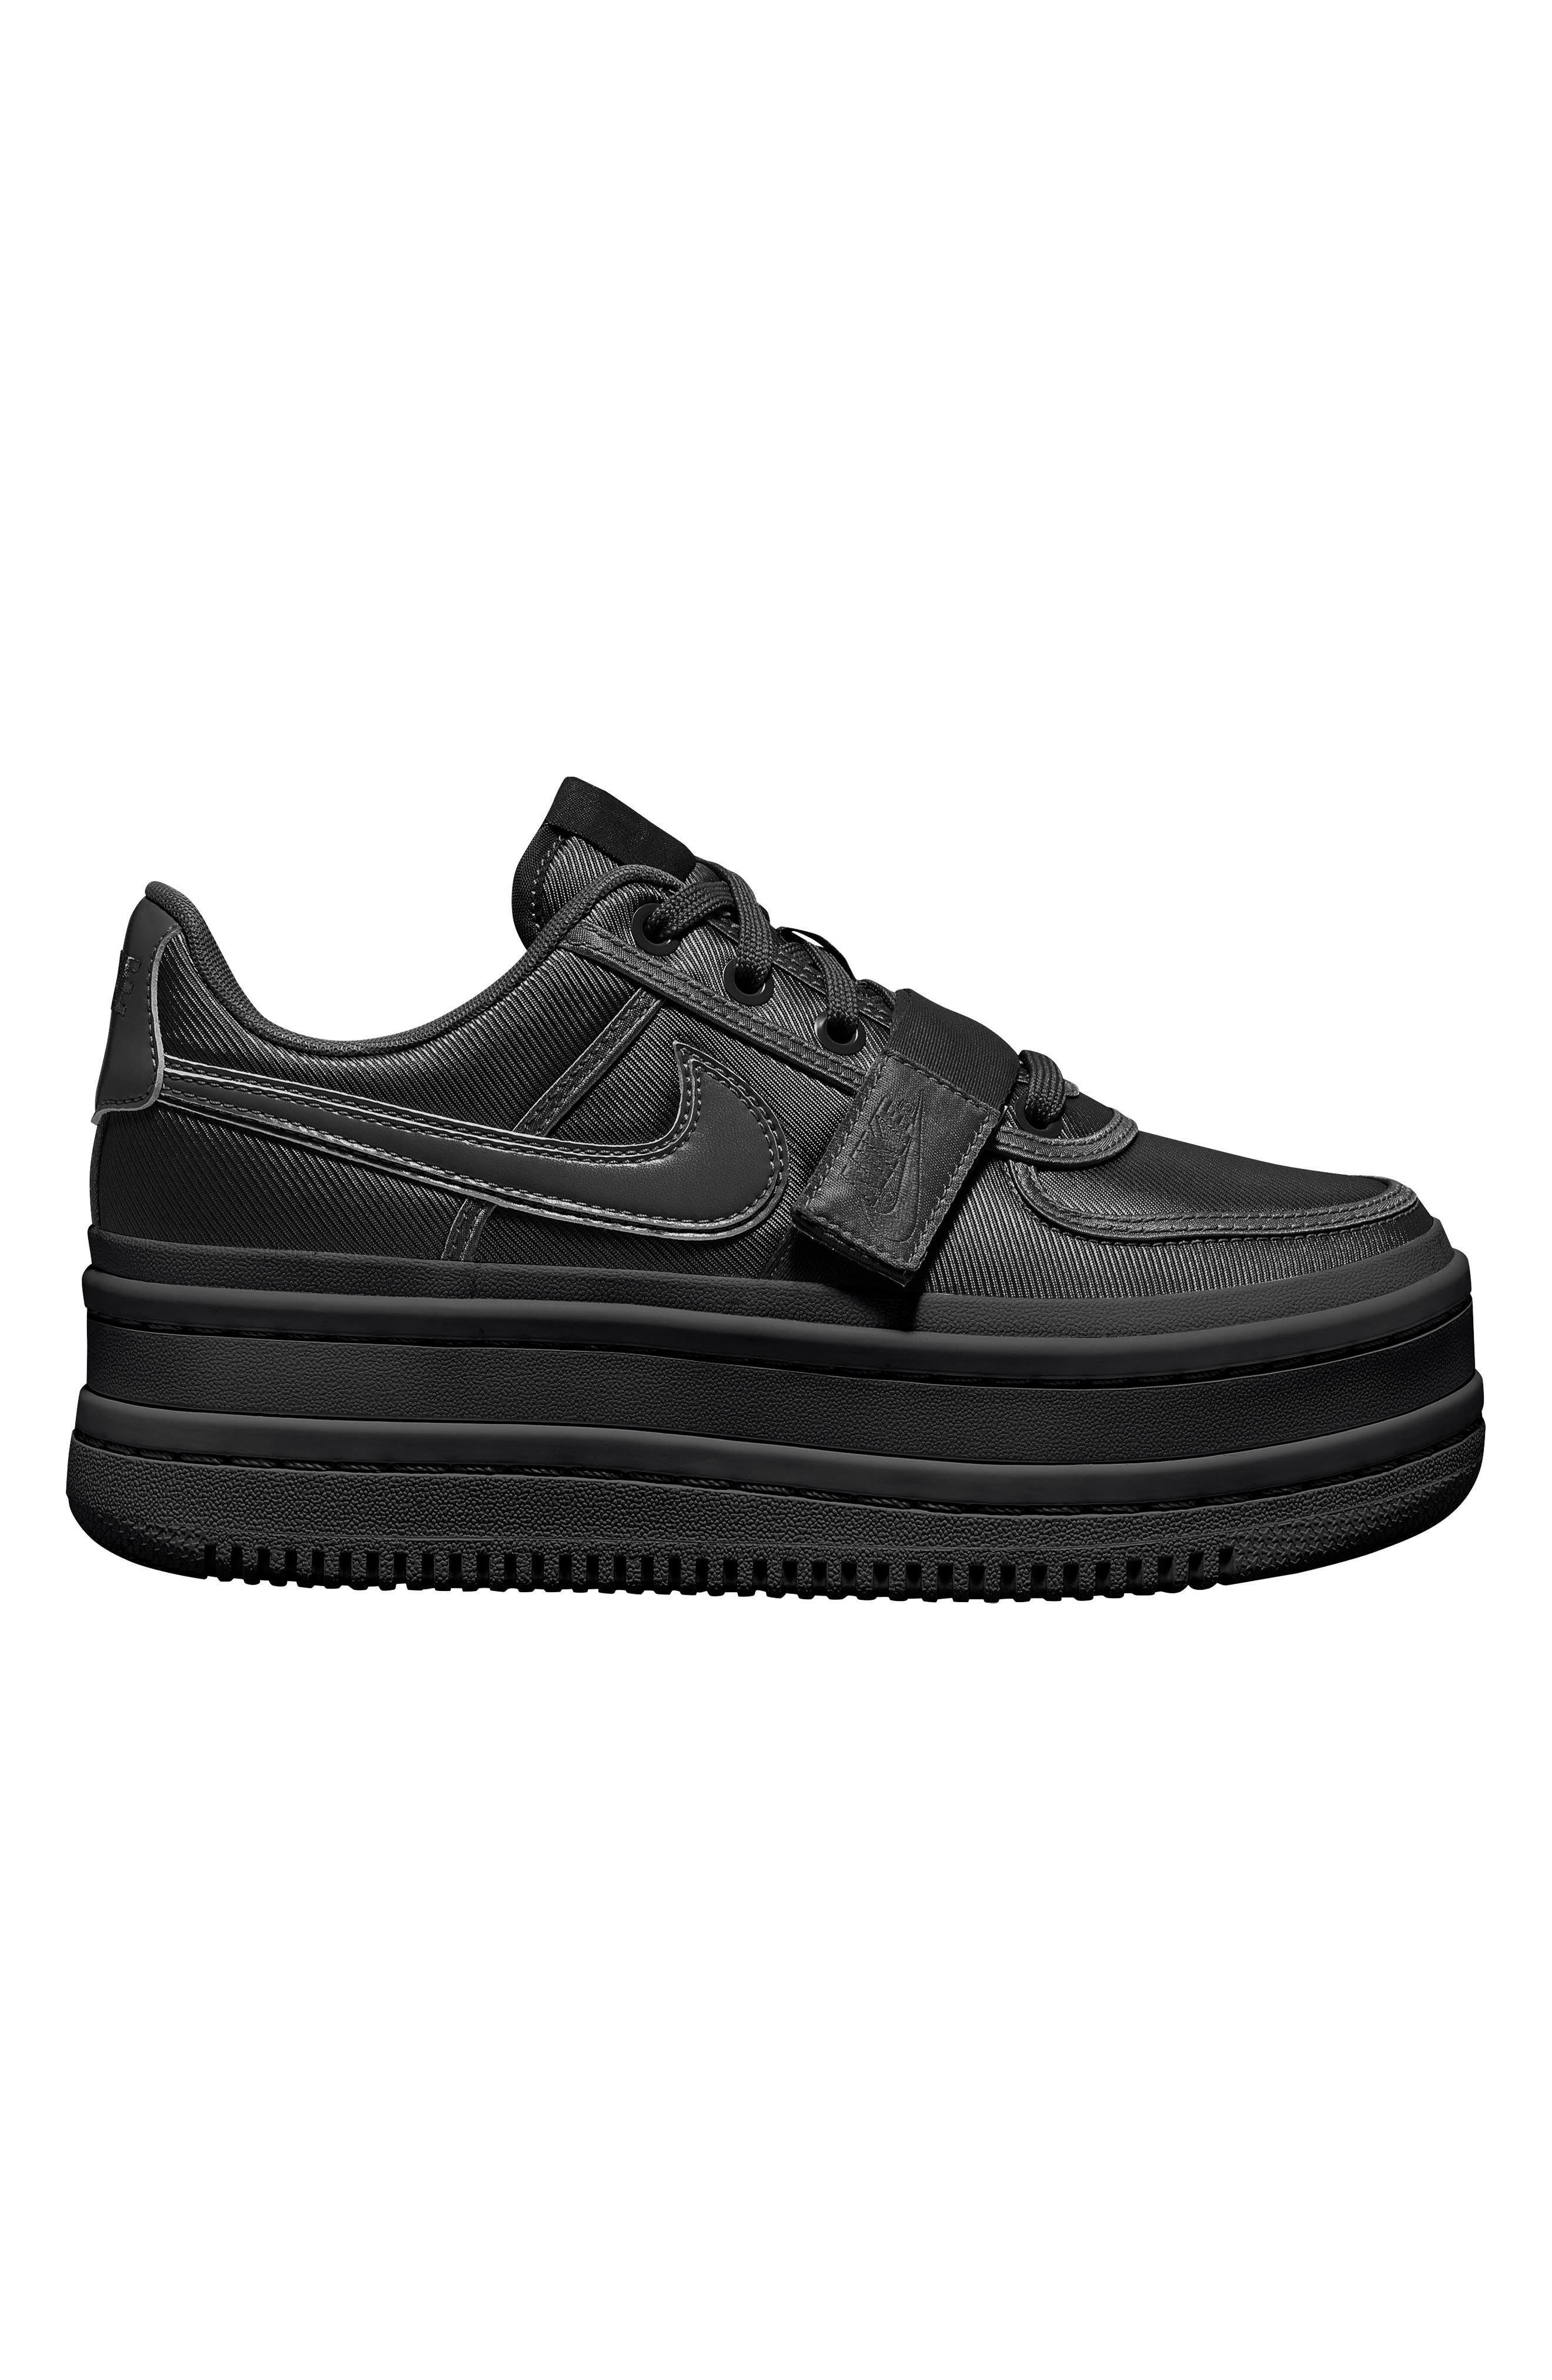 new styles 37a8f 7328e low price nike vandal 2k sneaker women 25ab5 e6c0d